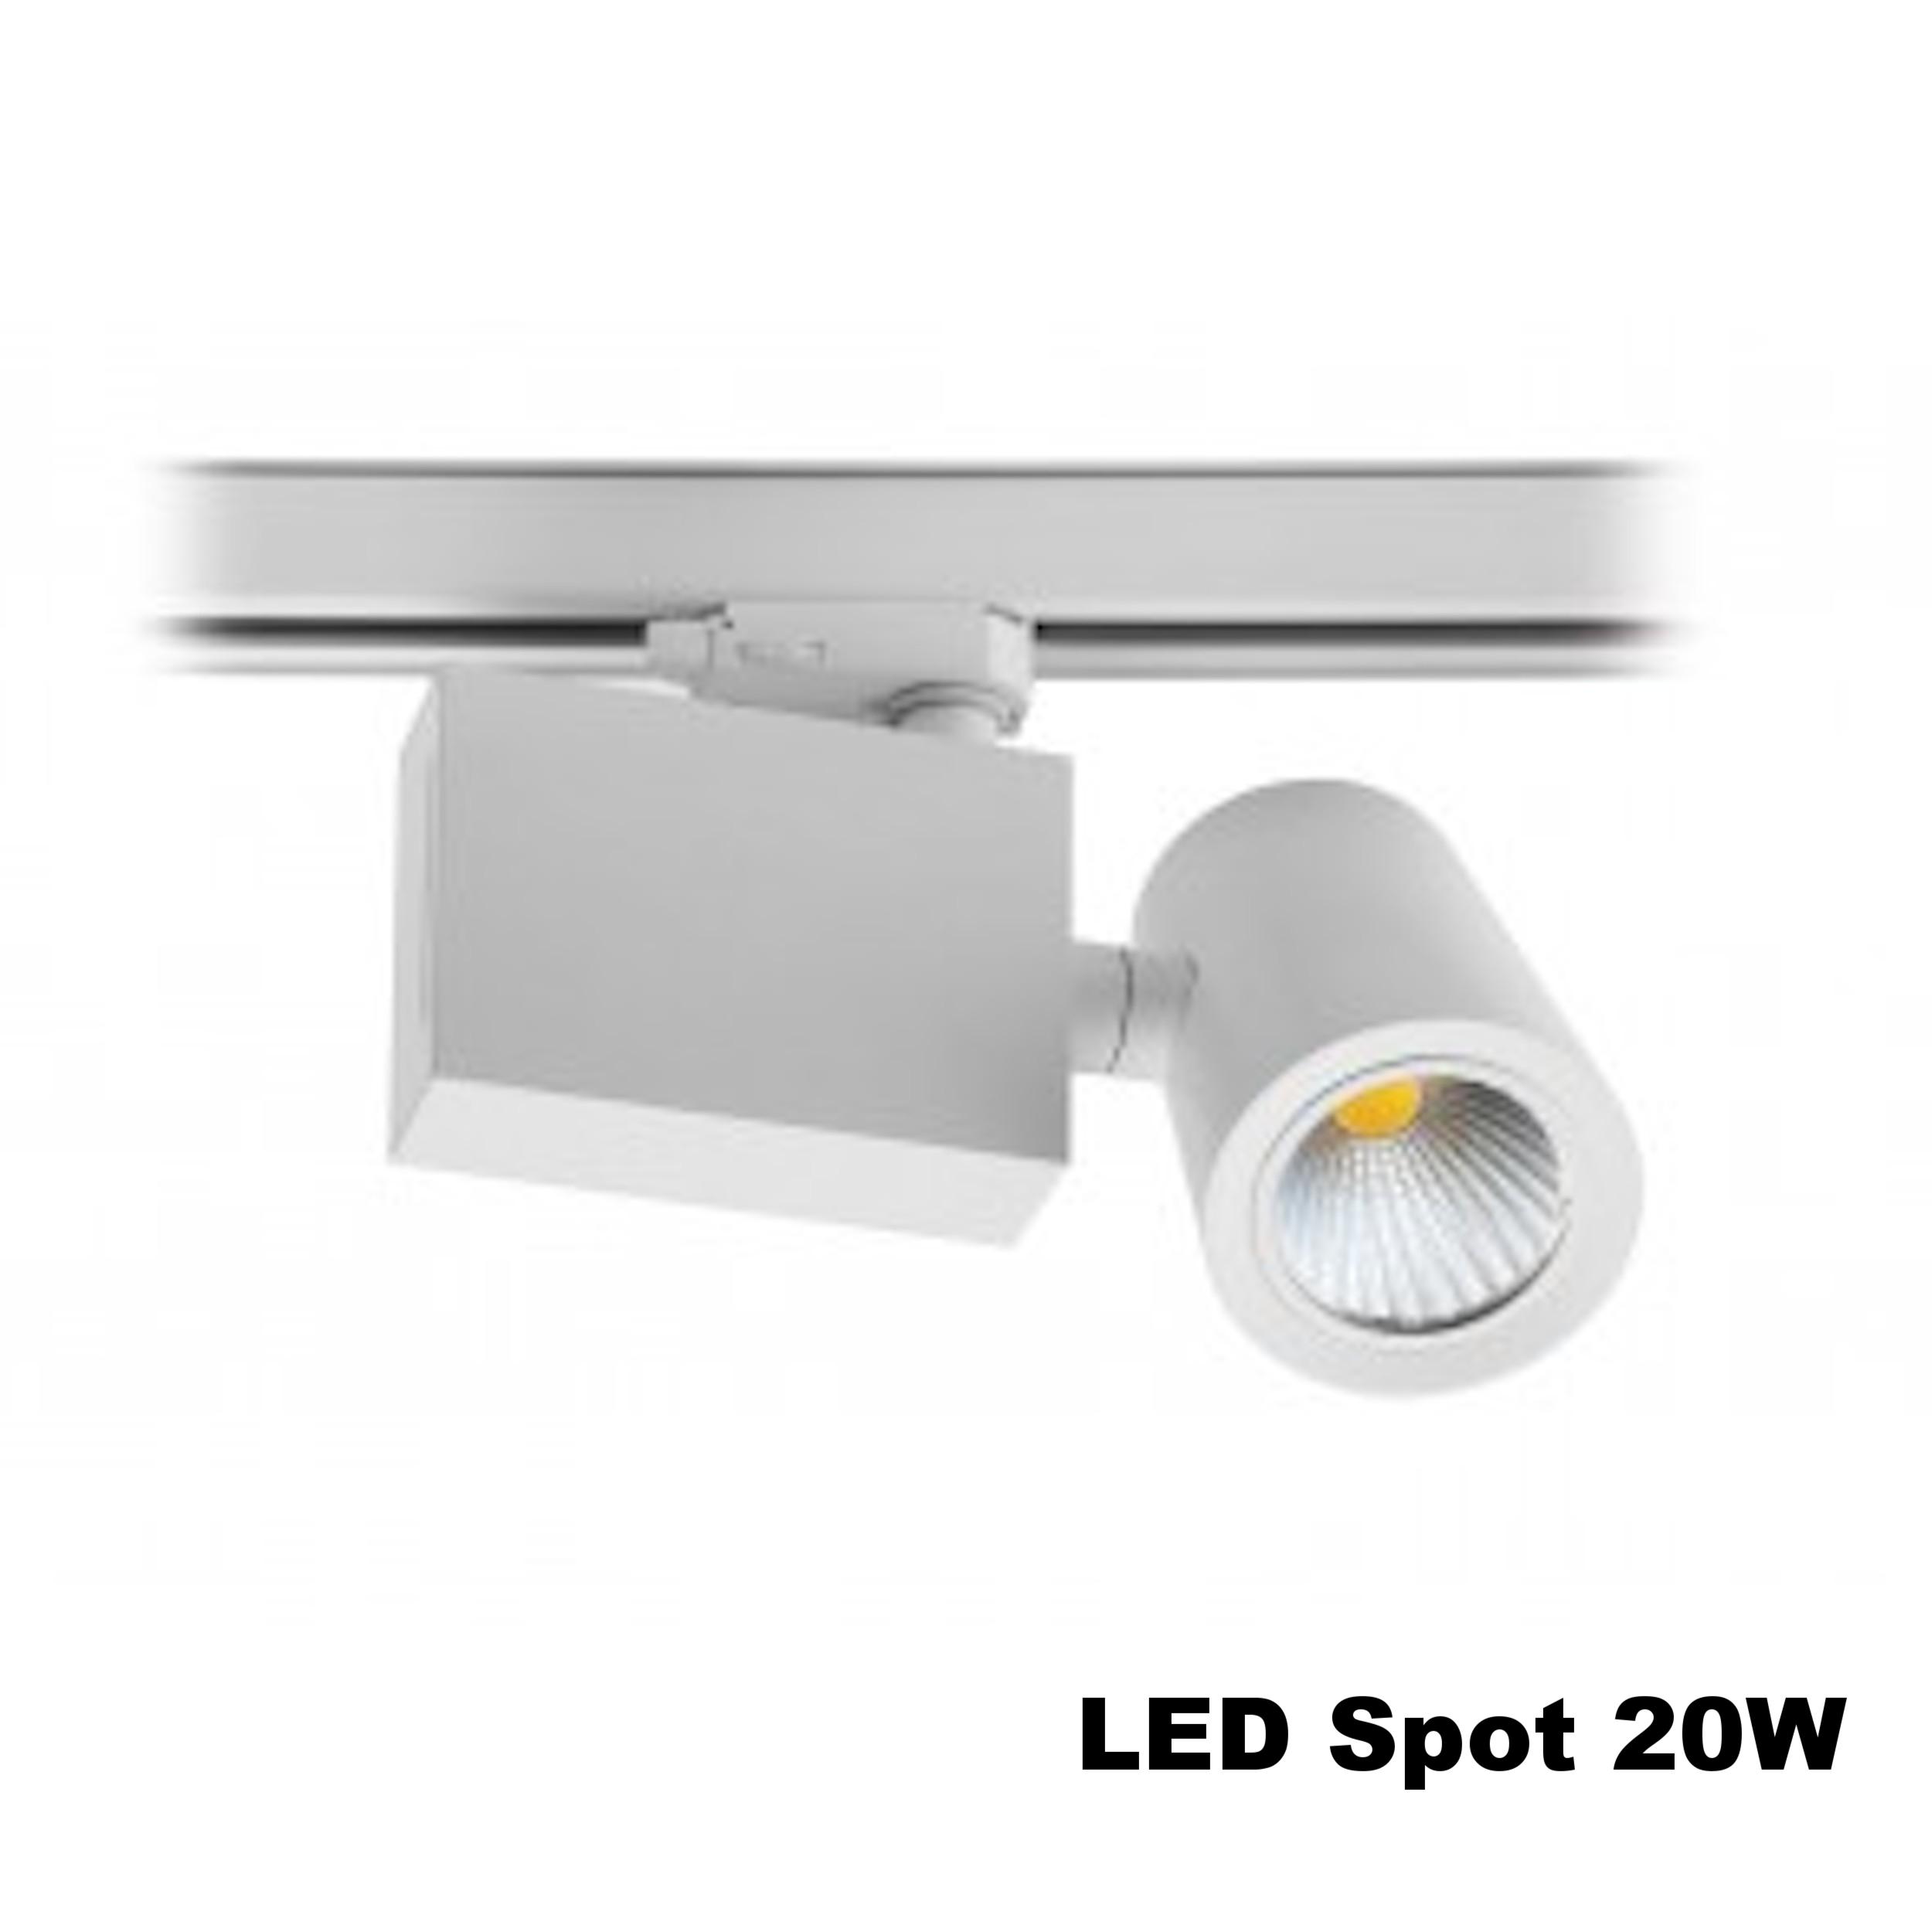 LED SPOT 20W